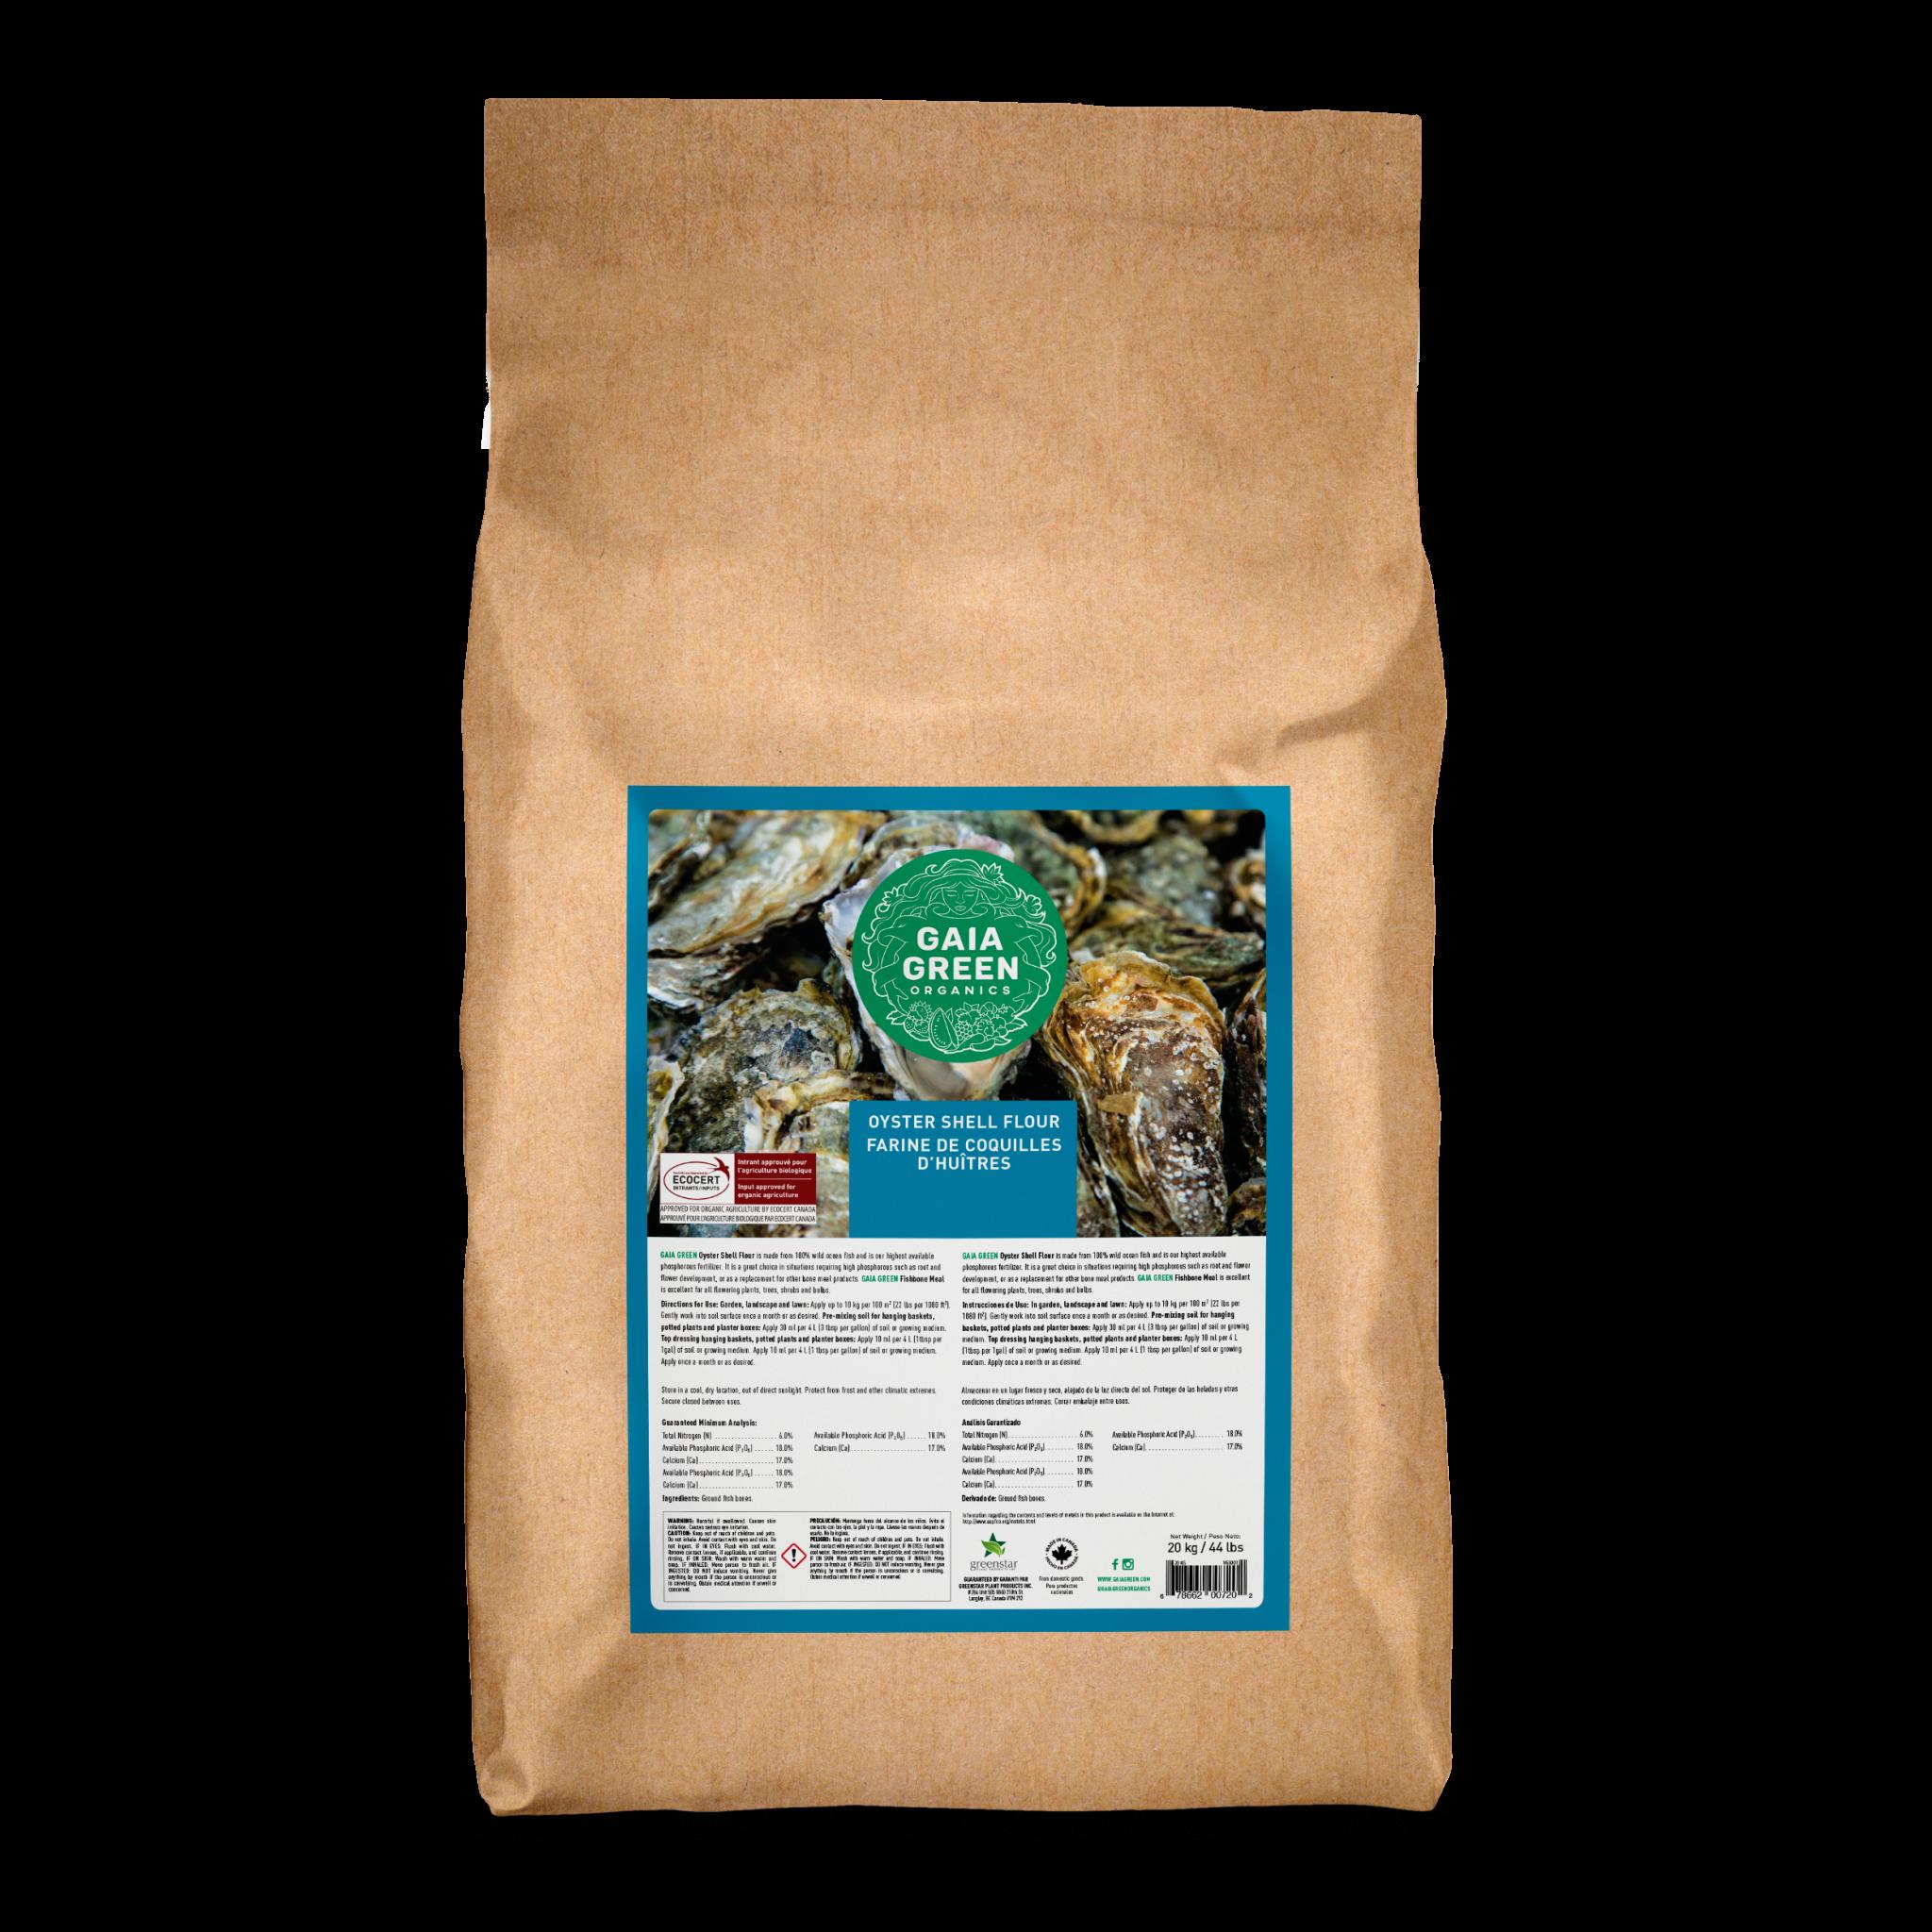 Gaia Green Oyster Shell Flour